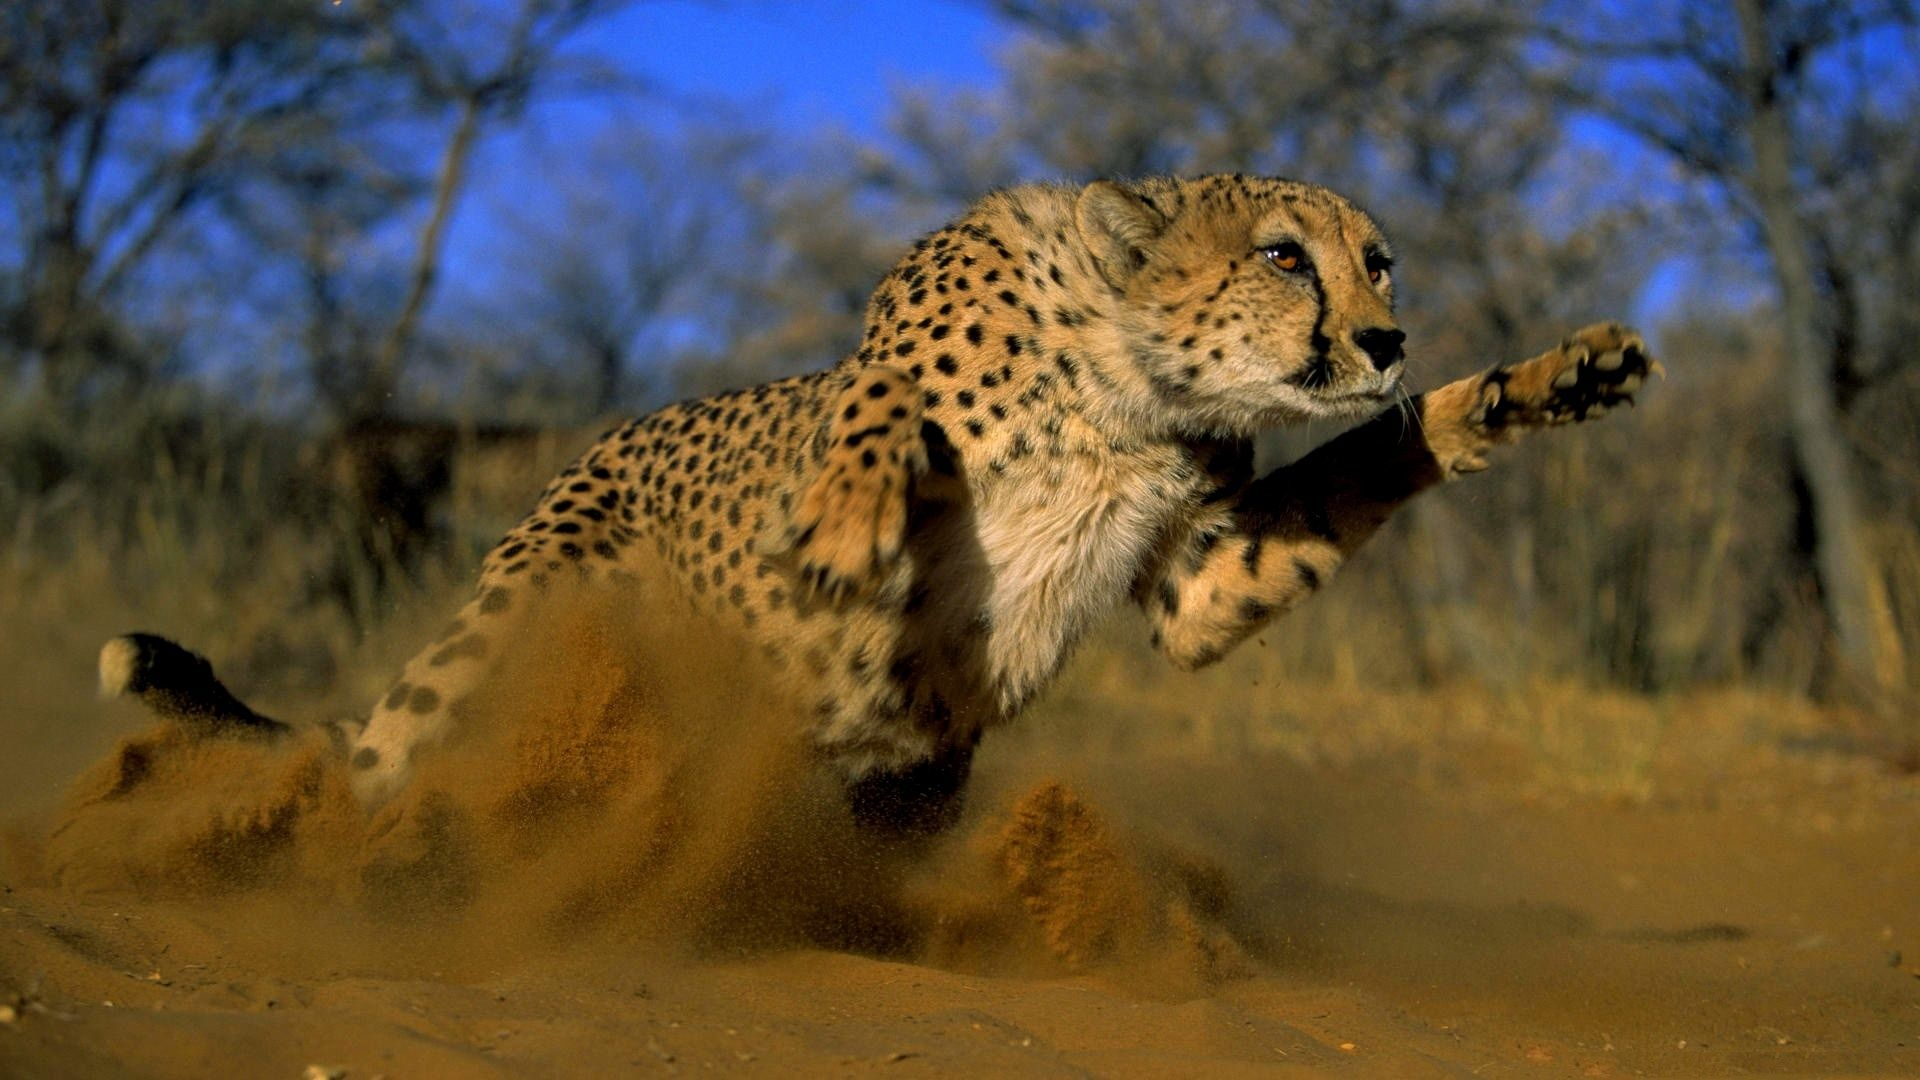 Wallpaper Sand, Cat, Jump, Dust, Cheetah, Wild, Sand, Cat, Jump, Dust